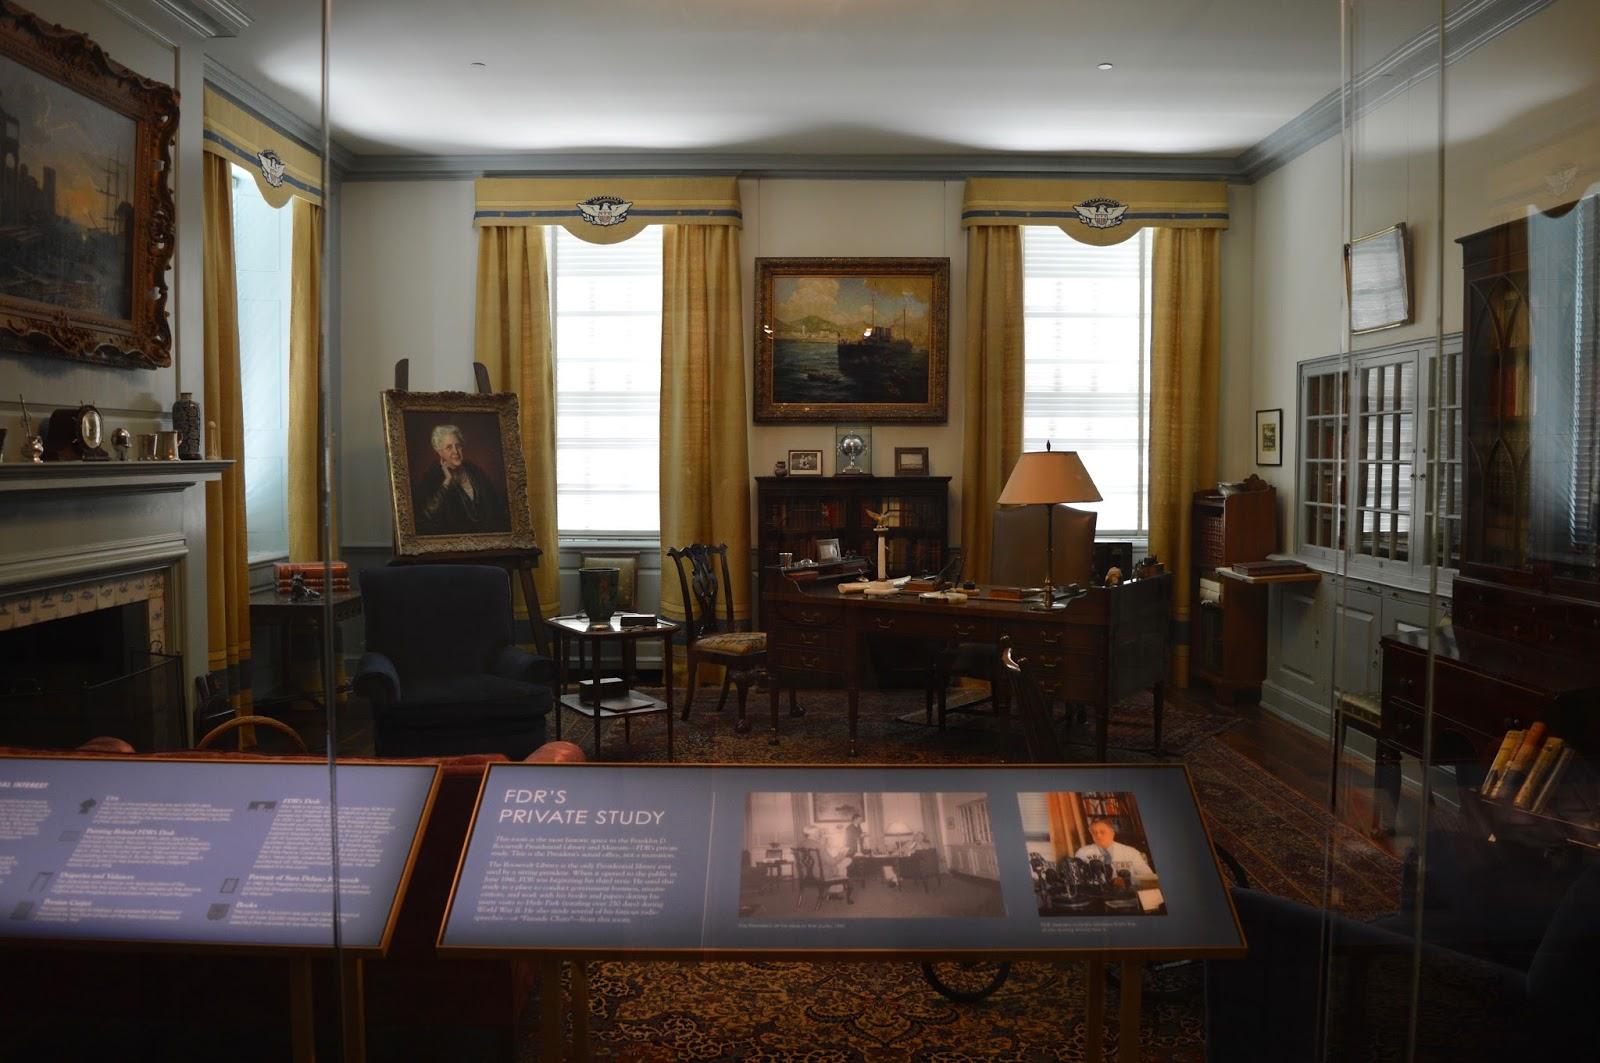 FDR's Presidential Library